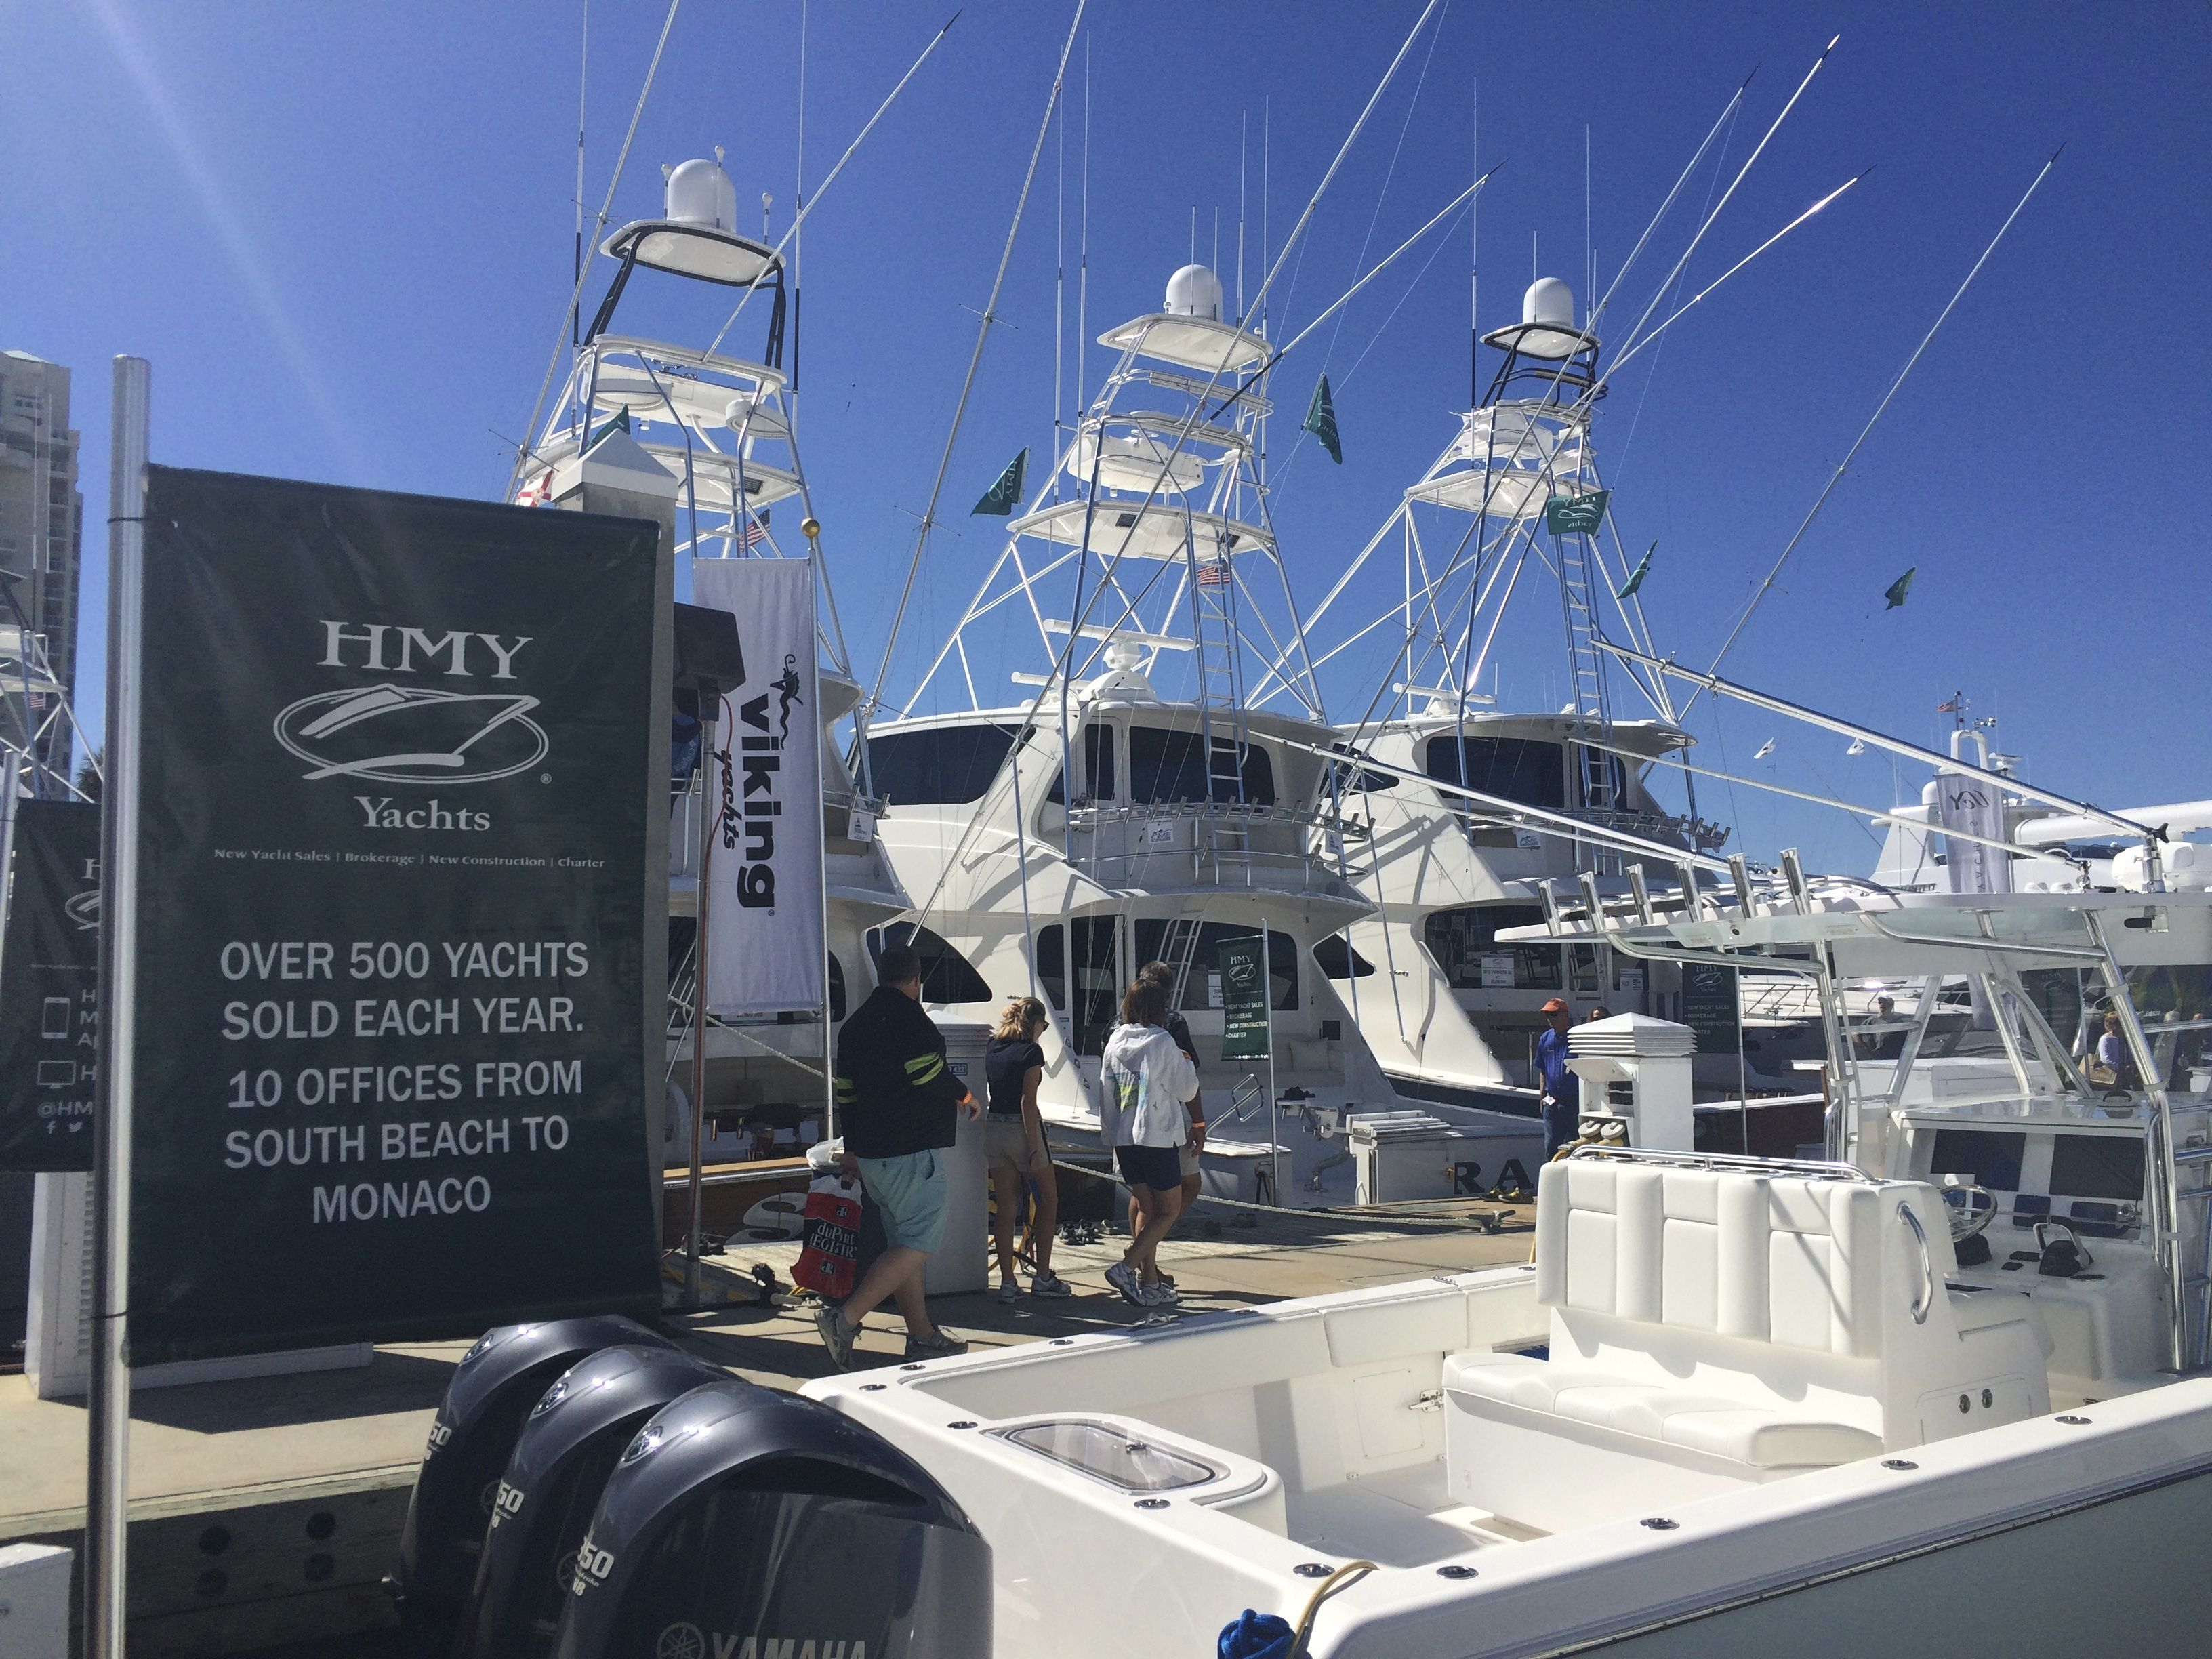 Fort Lauderdale International Boat Show October 30